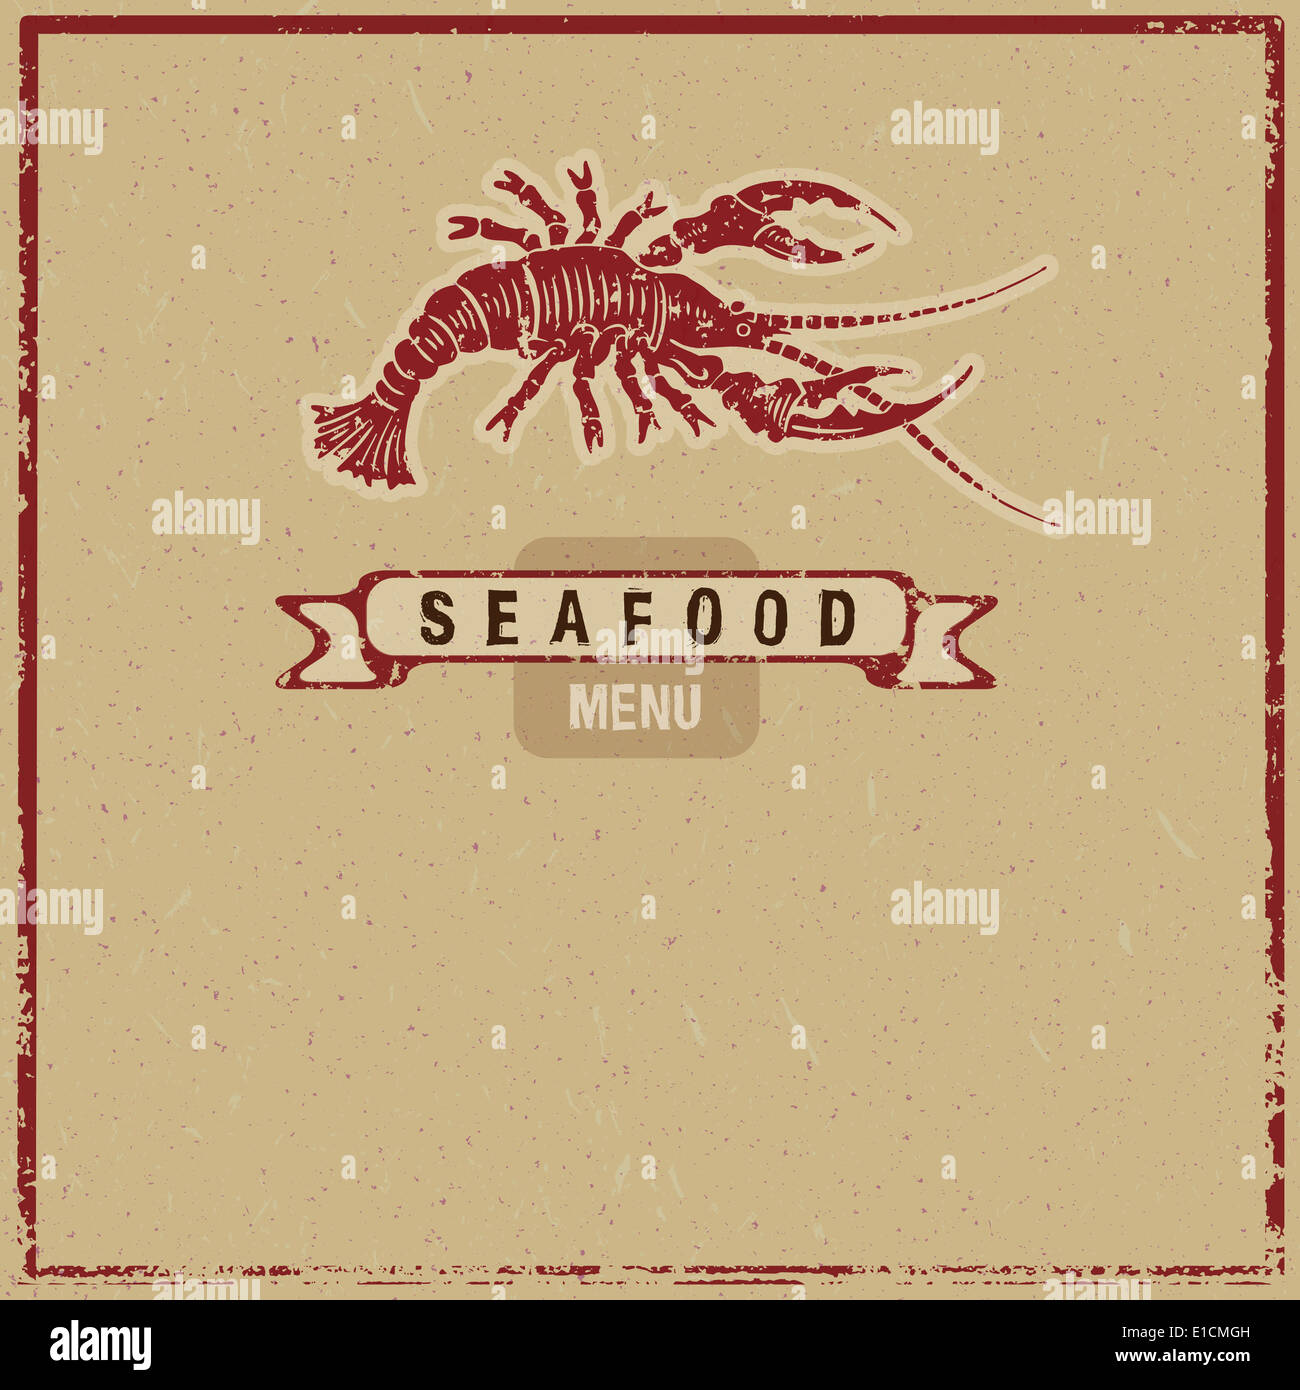 woodcut seafood menu cover - Stock Image